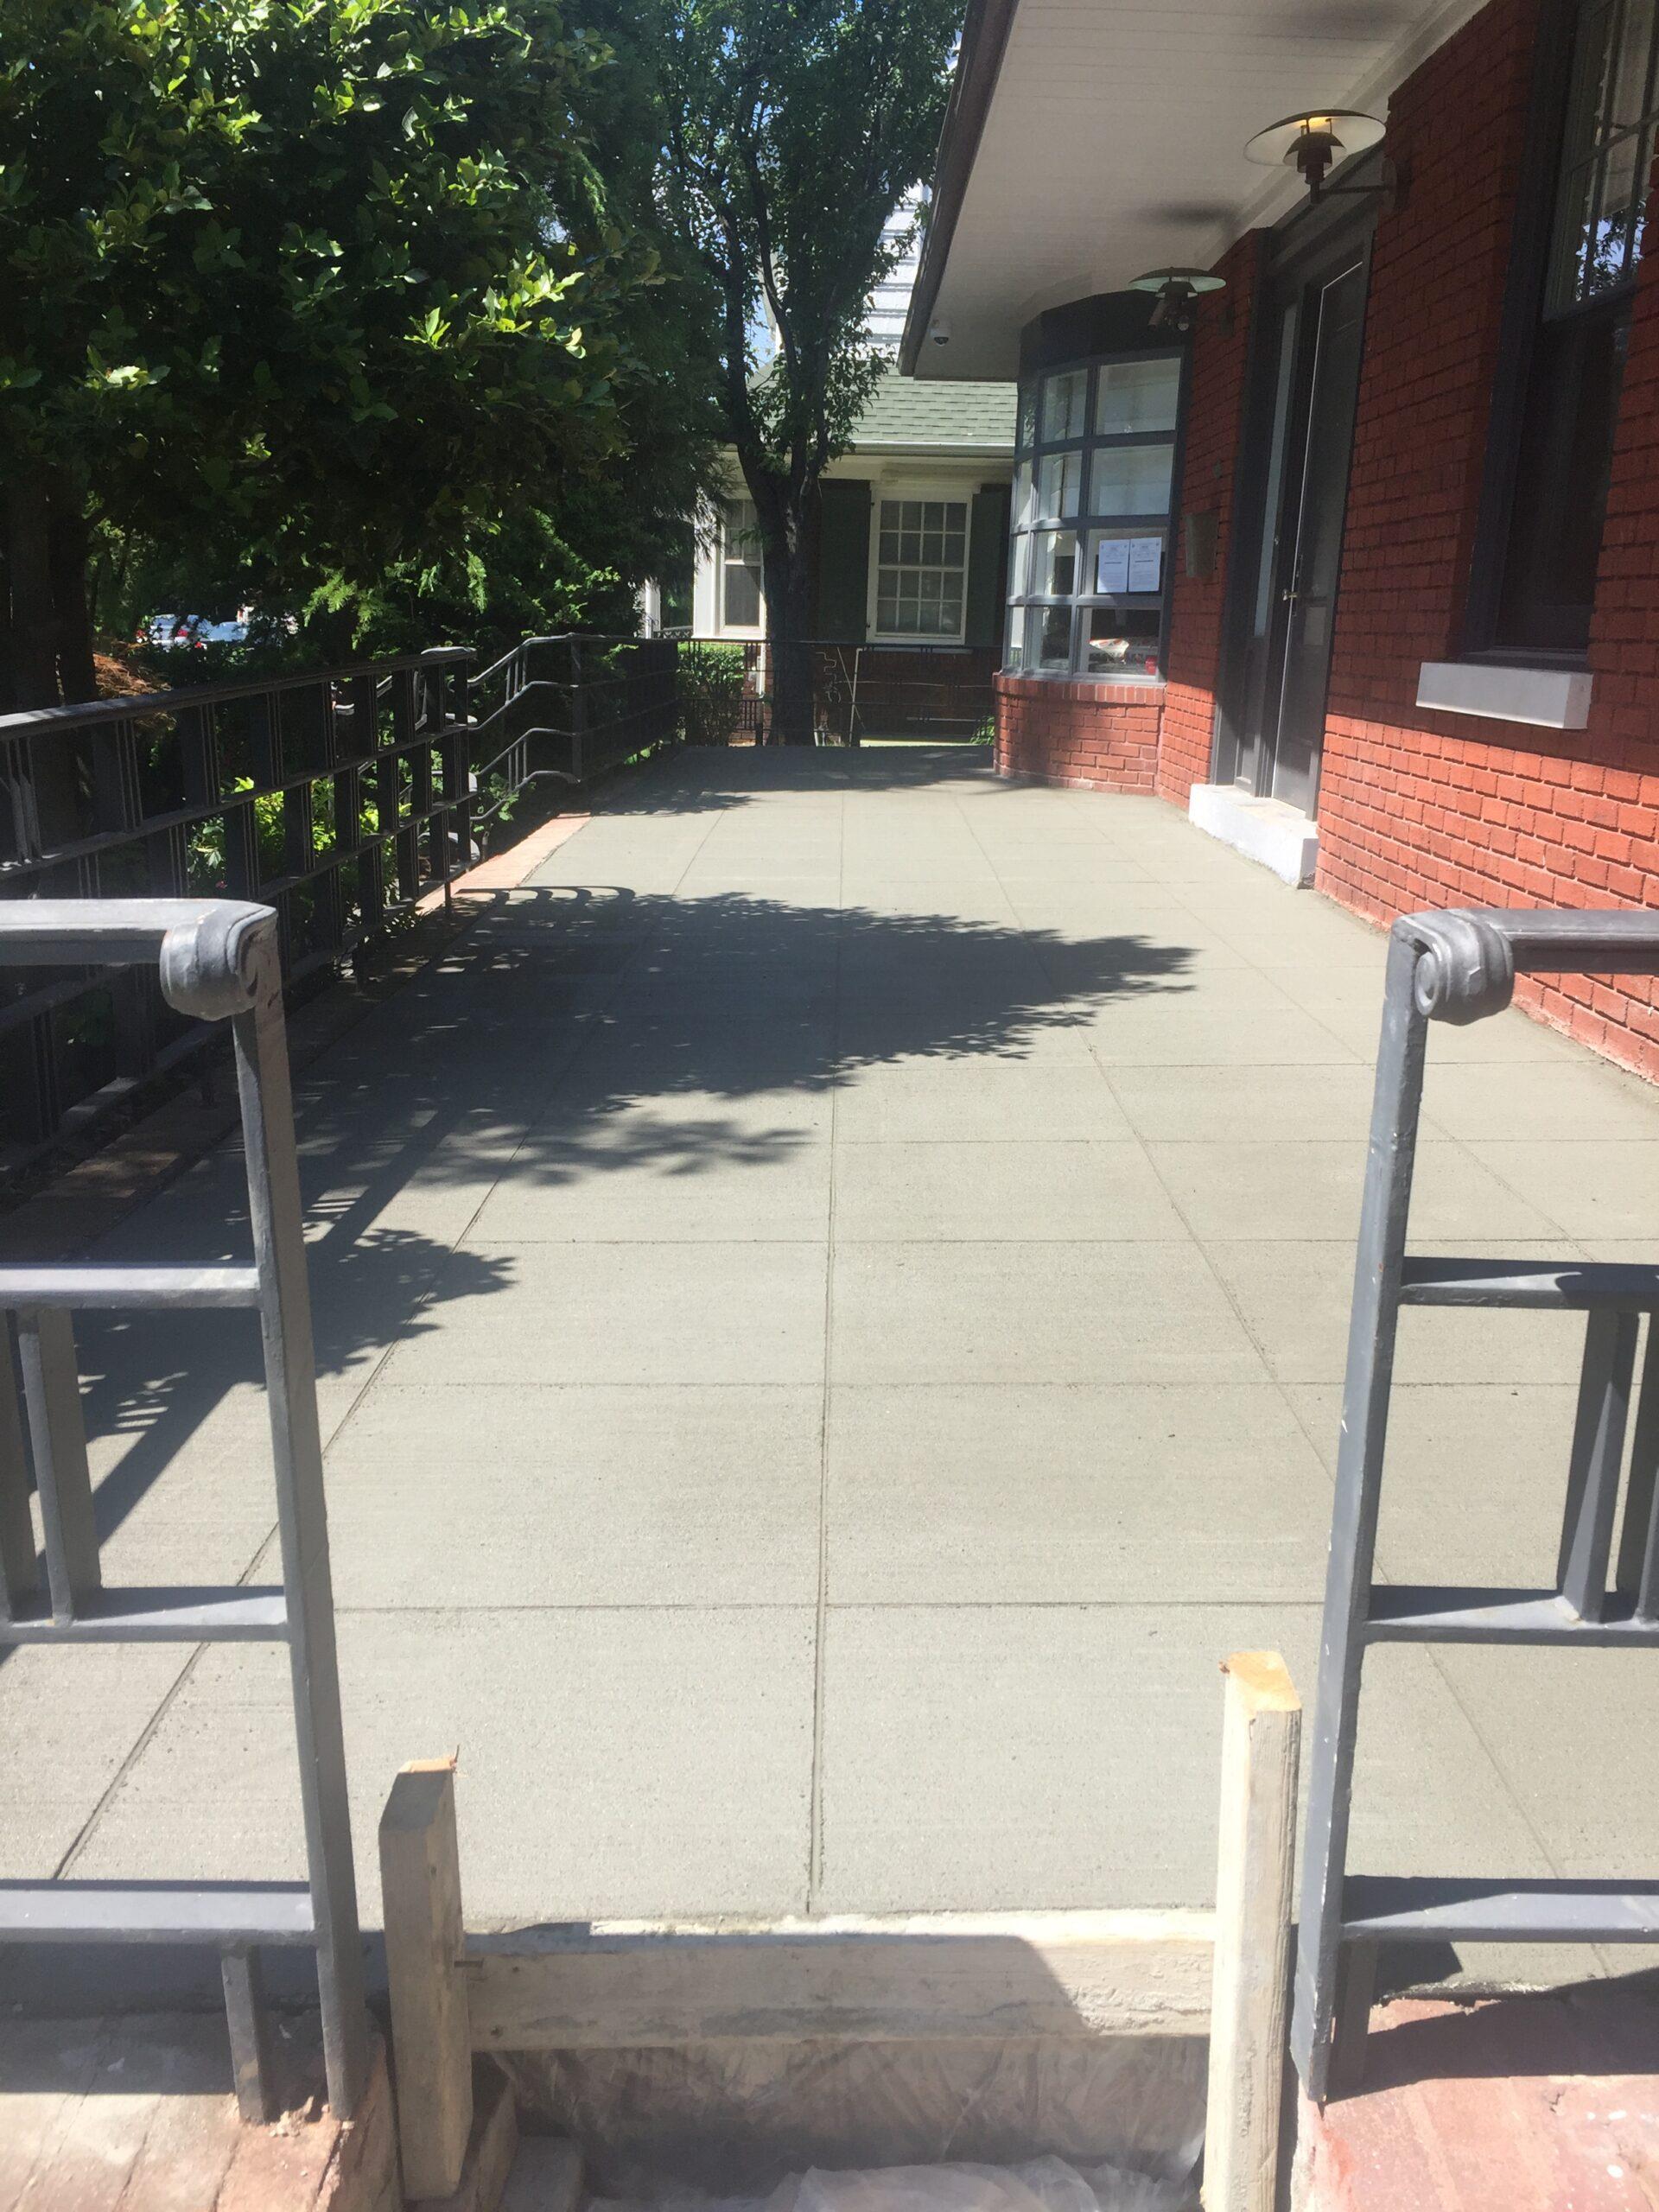 145 Argyle Rd- Prospect Park South Brooklyn- Sidewalk Renovation